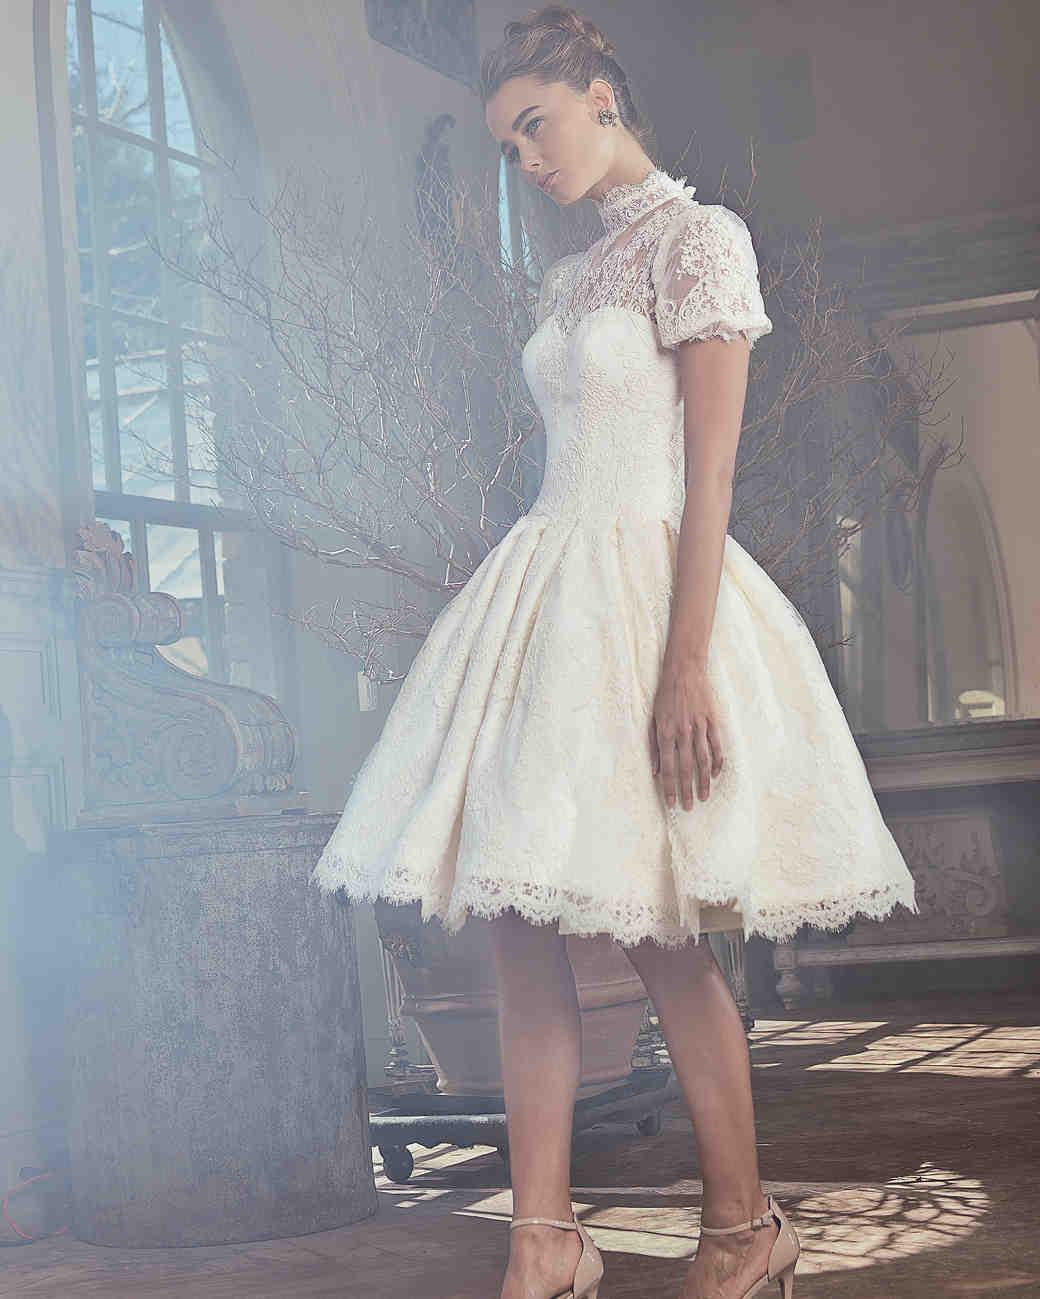 Awesome Fleur Delacour Wedding Dress For Sale Ideas Wedding Ideas